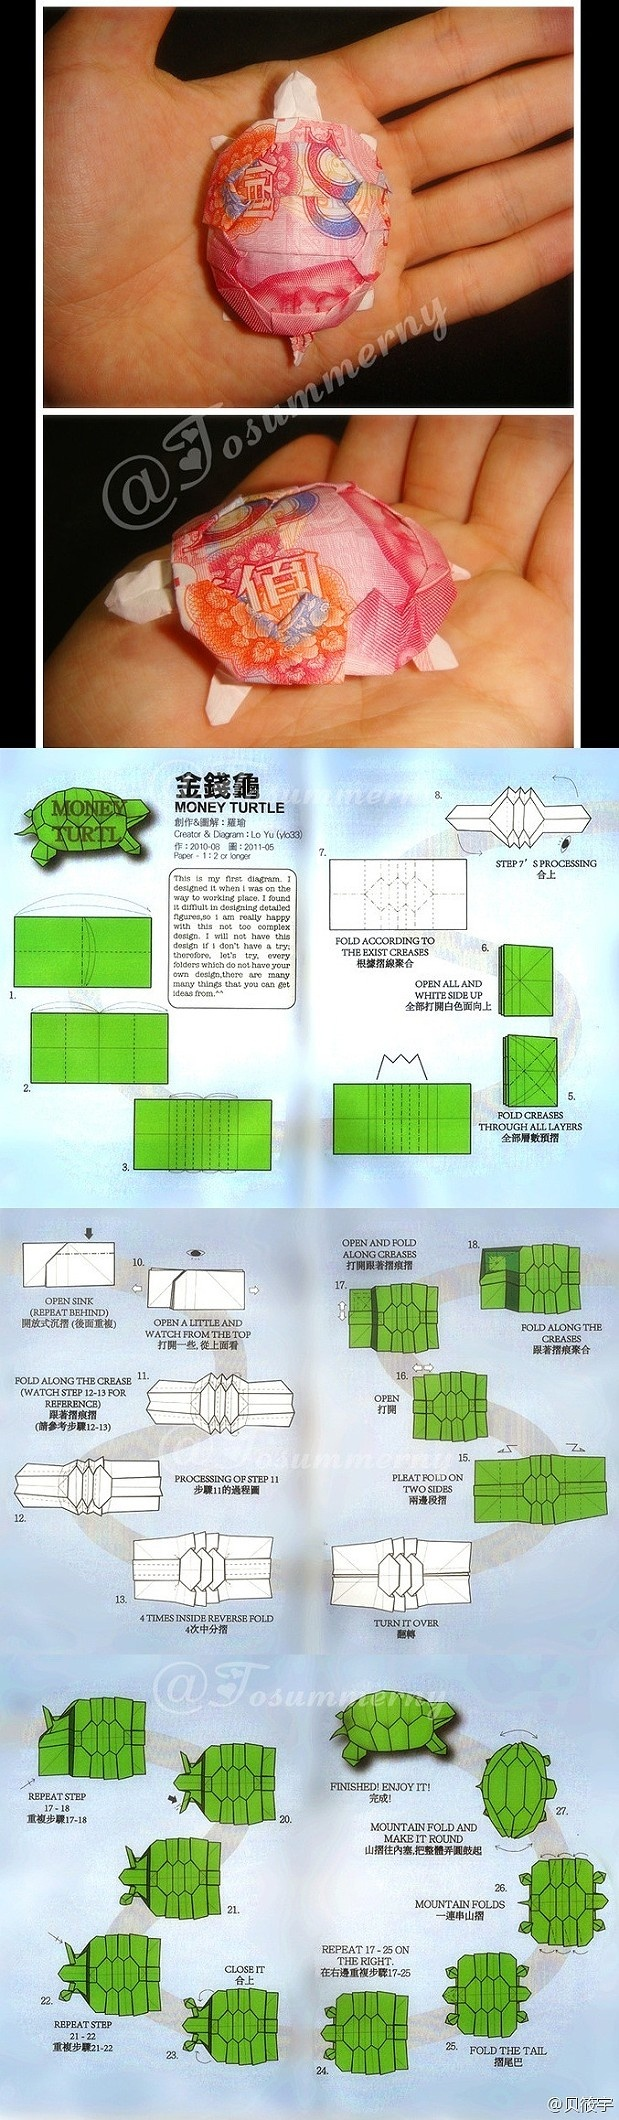 Handmade money turtle!  !